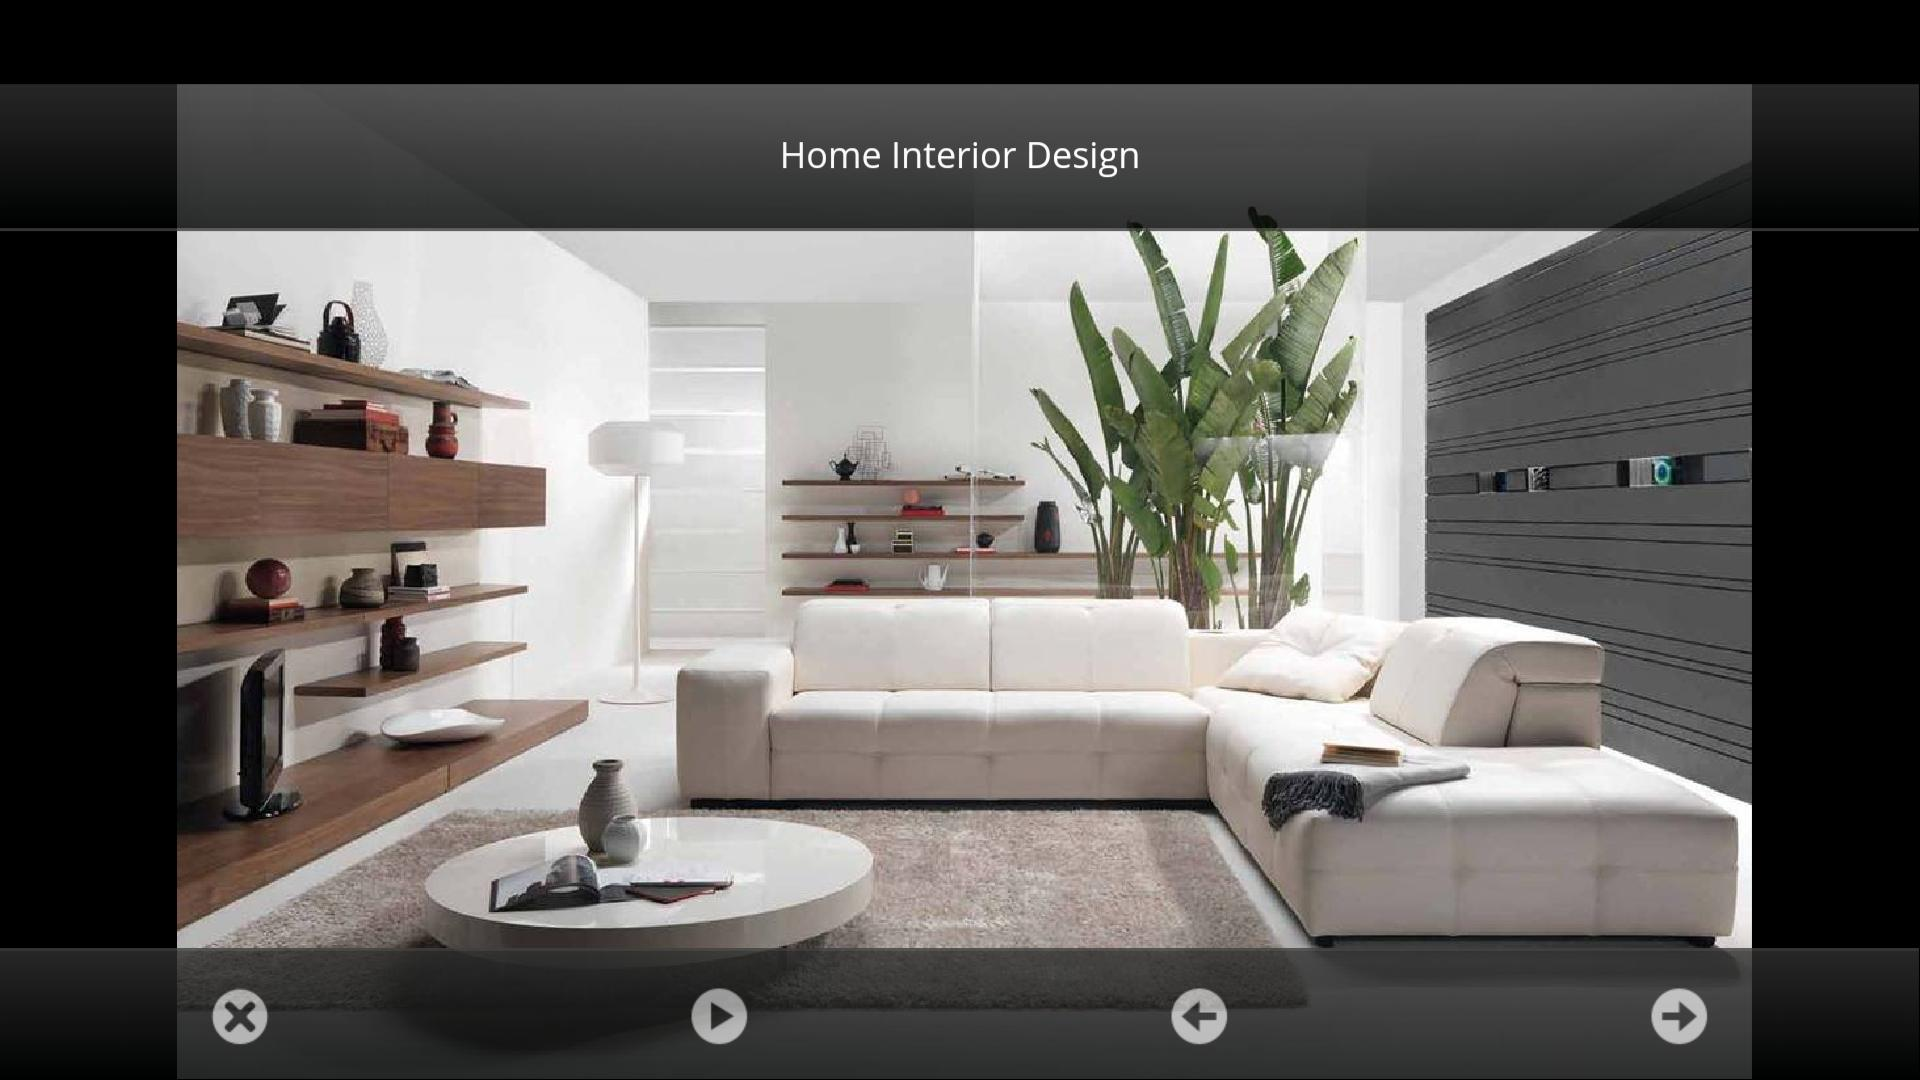 Design De Interiores Para Android Apk Baixar